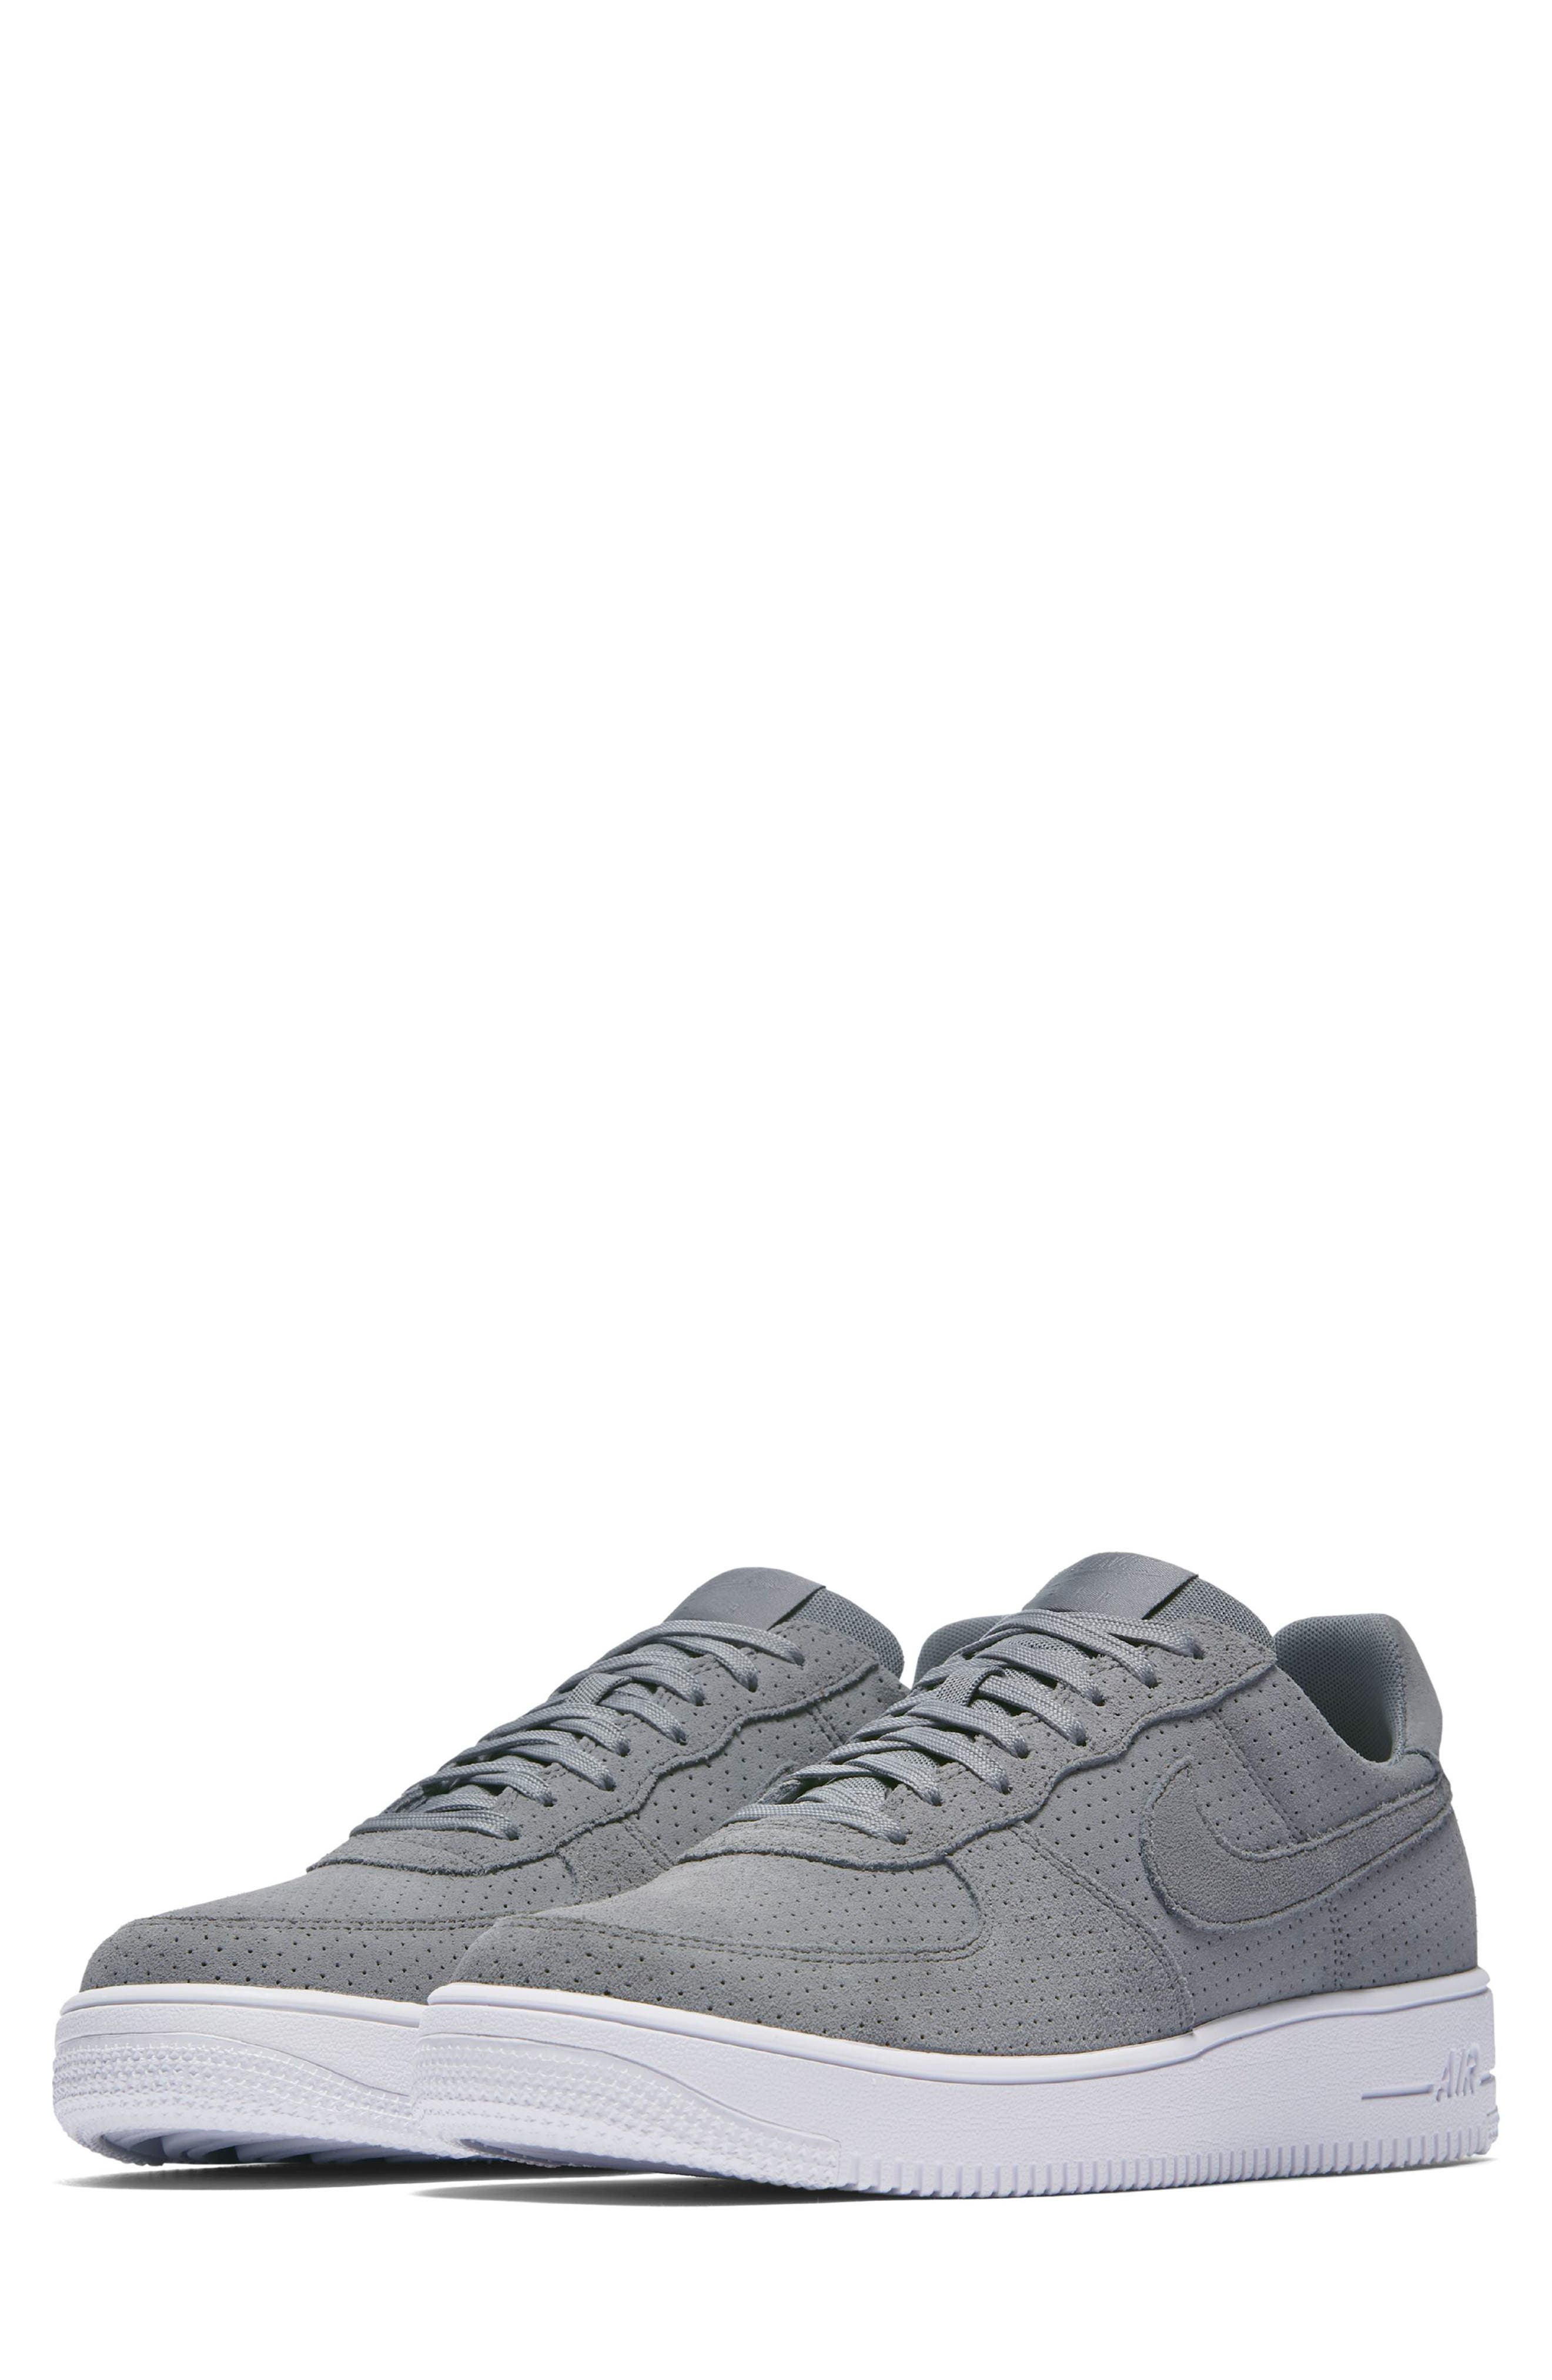 Air Force 1 Ultraforce Sneaker,                         Main,                         color, 029